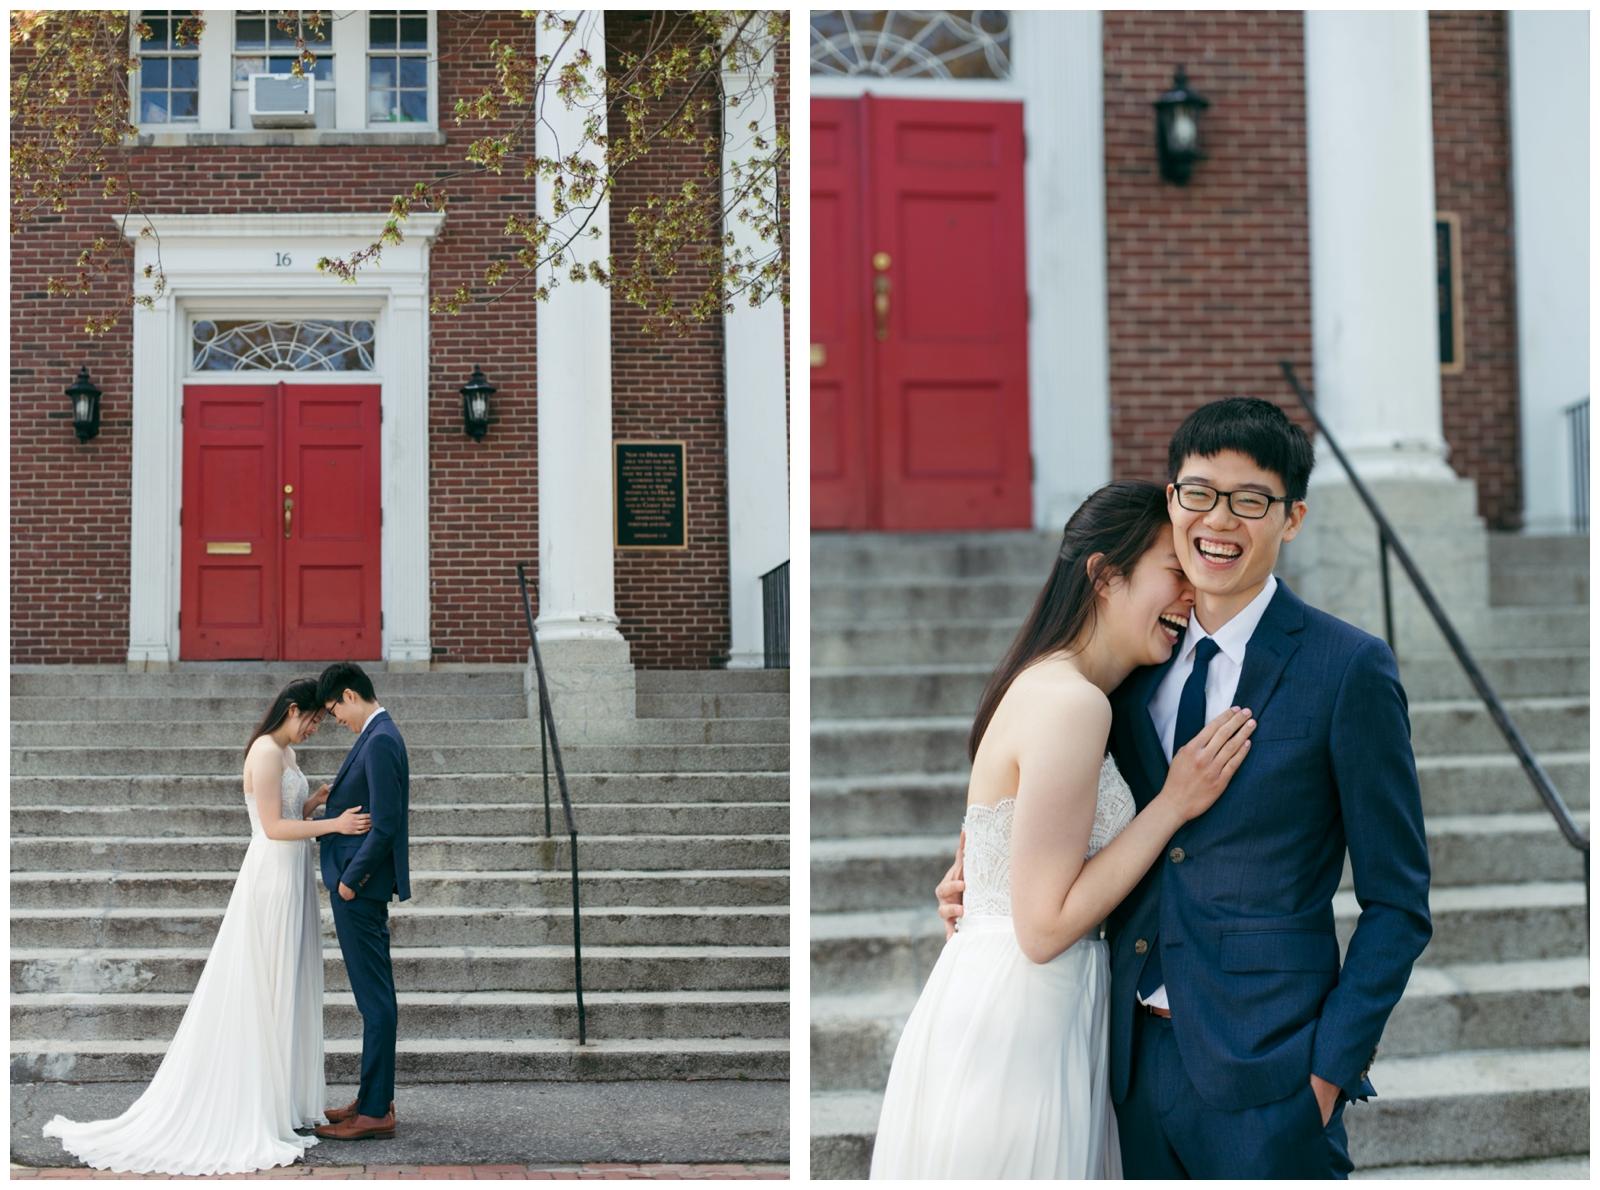 Samberg-Conference-Center-Boston-Wedding-Photographer-Bailey-Q-Photo-028.jpg